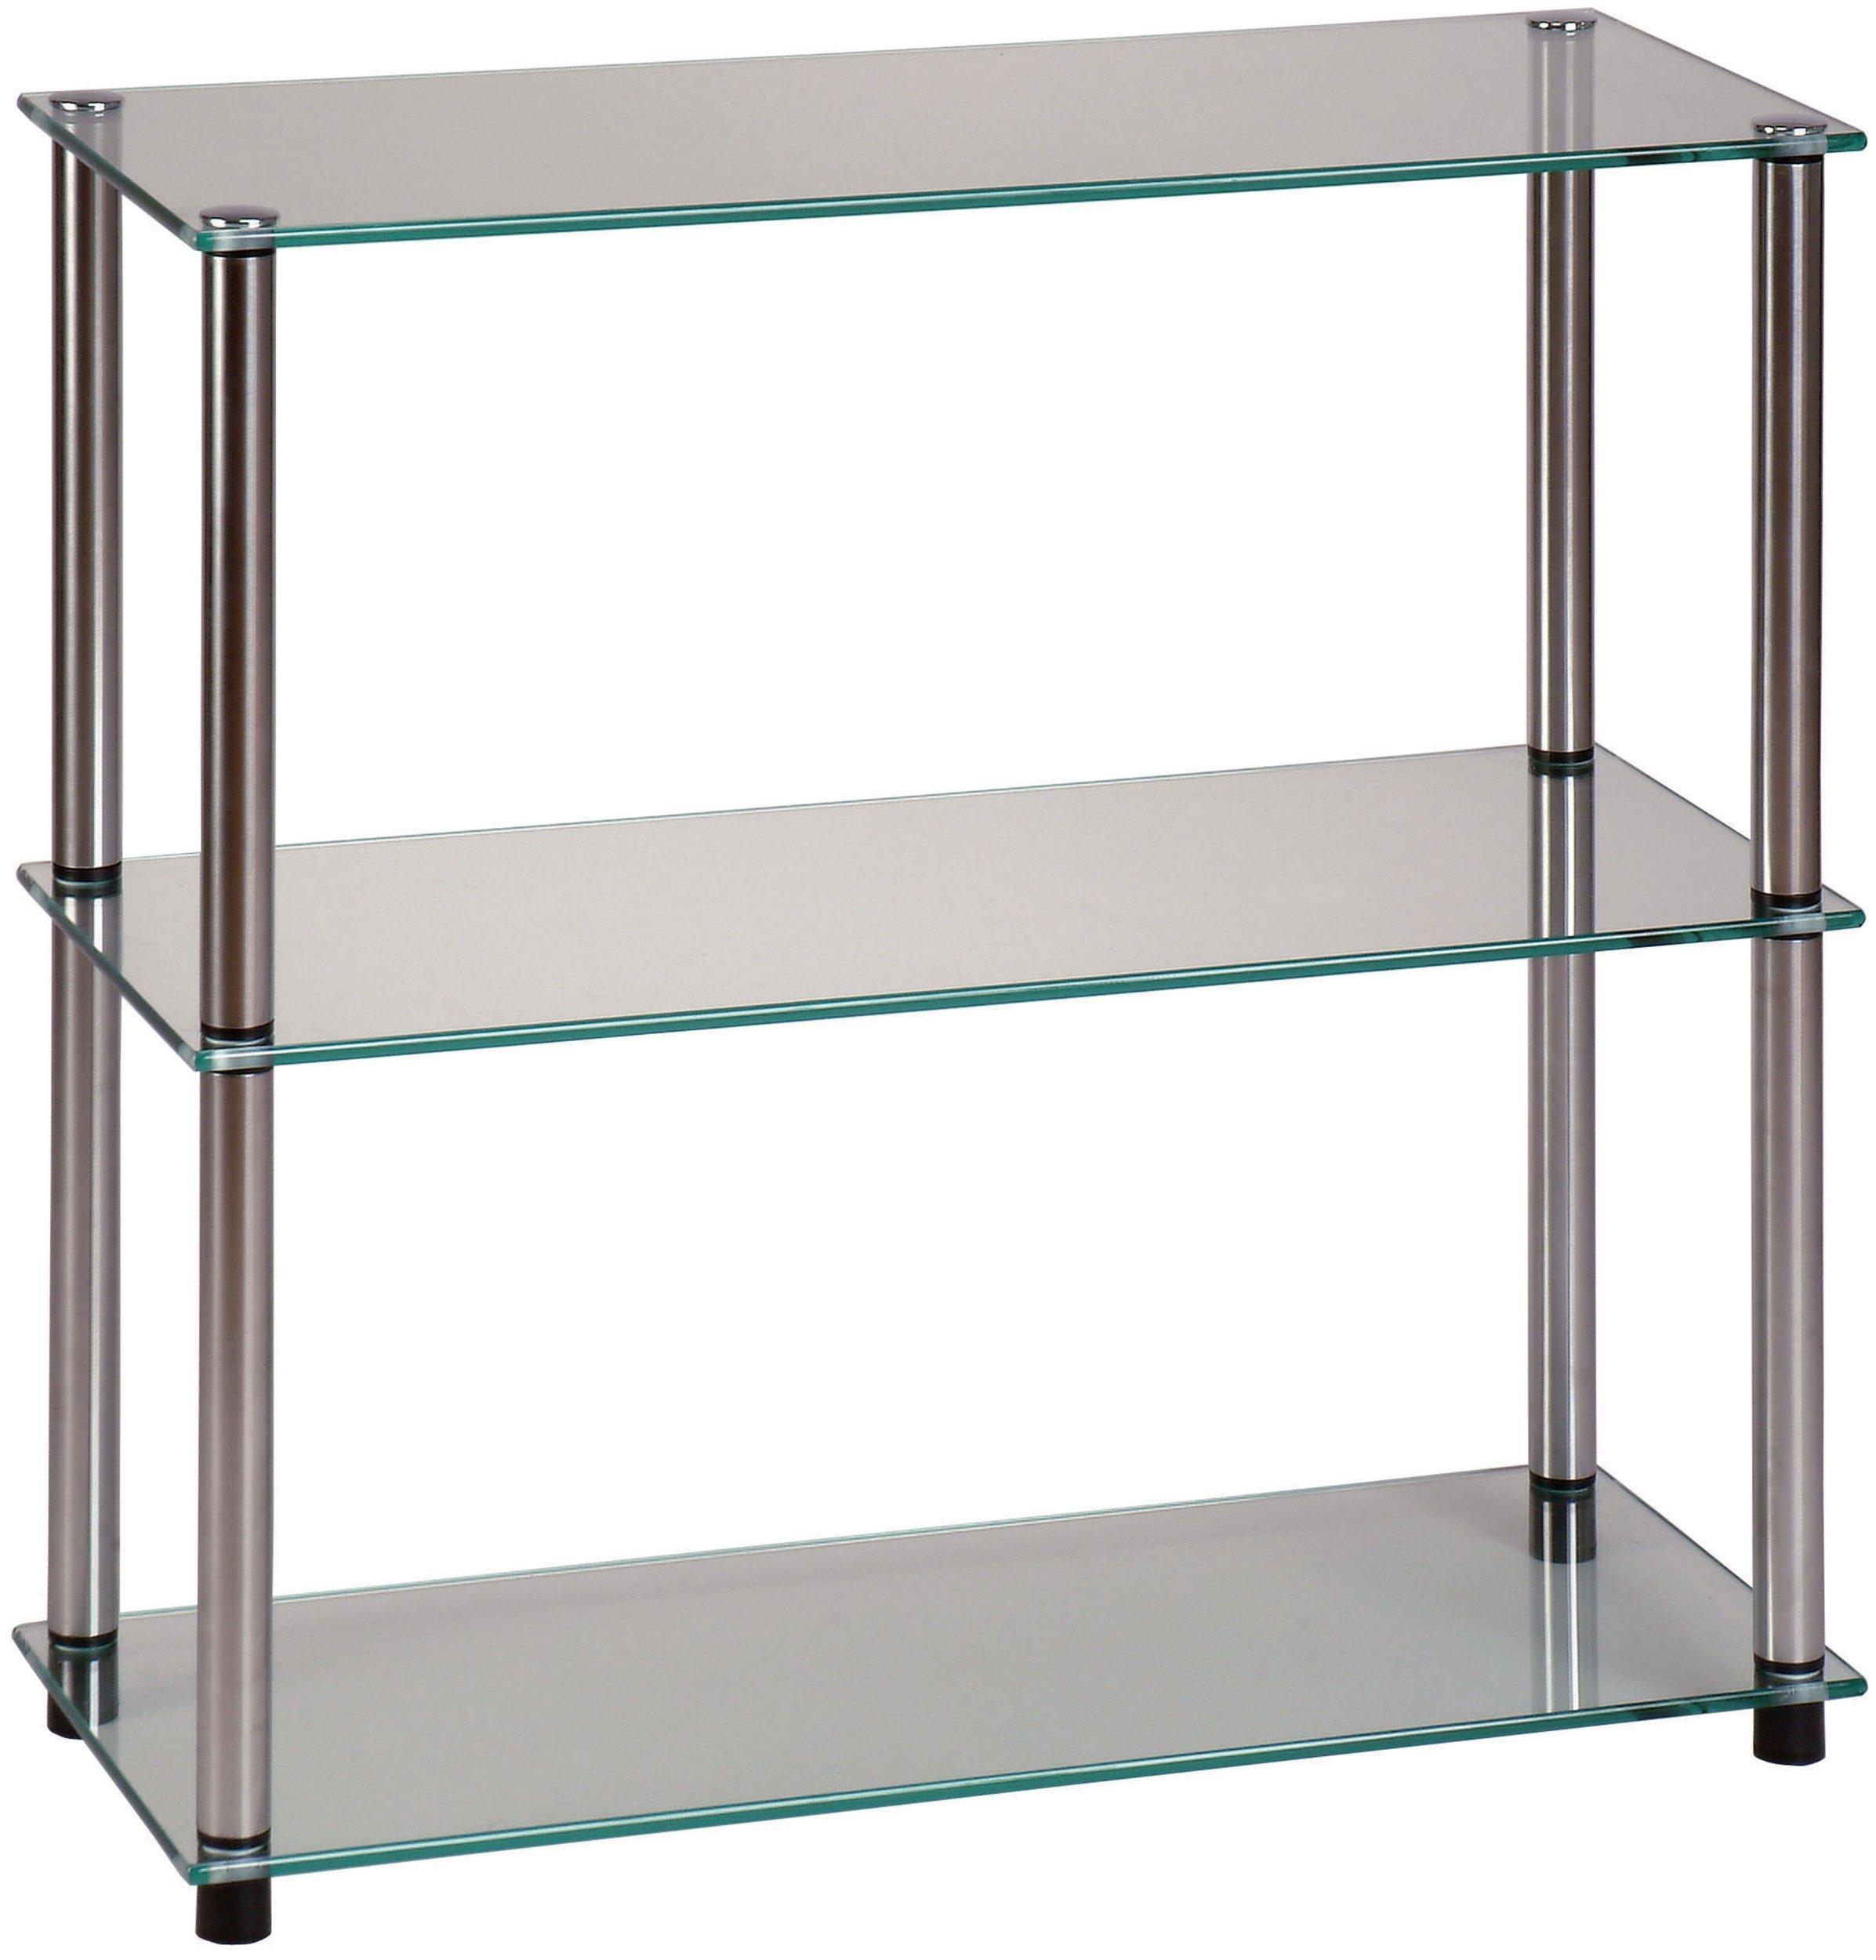 Convenience Concepts Designs2Go Go-Accsense 3-Shelf Glass Bookcase, Clear Glass by Convenience Concepts